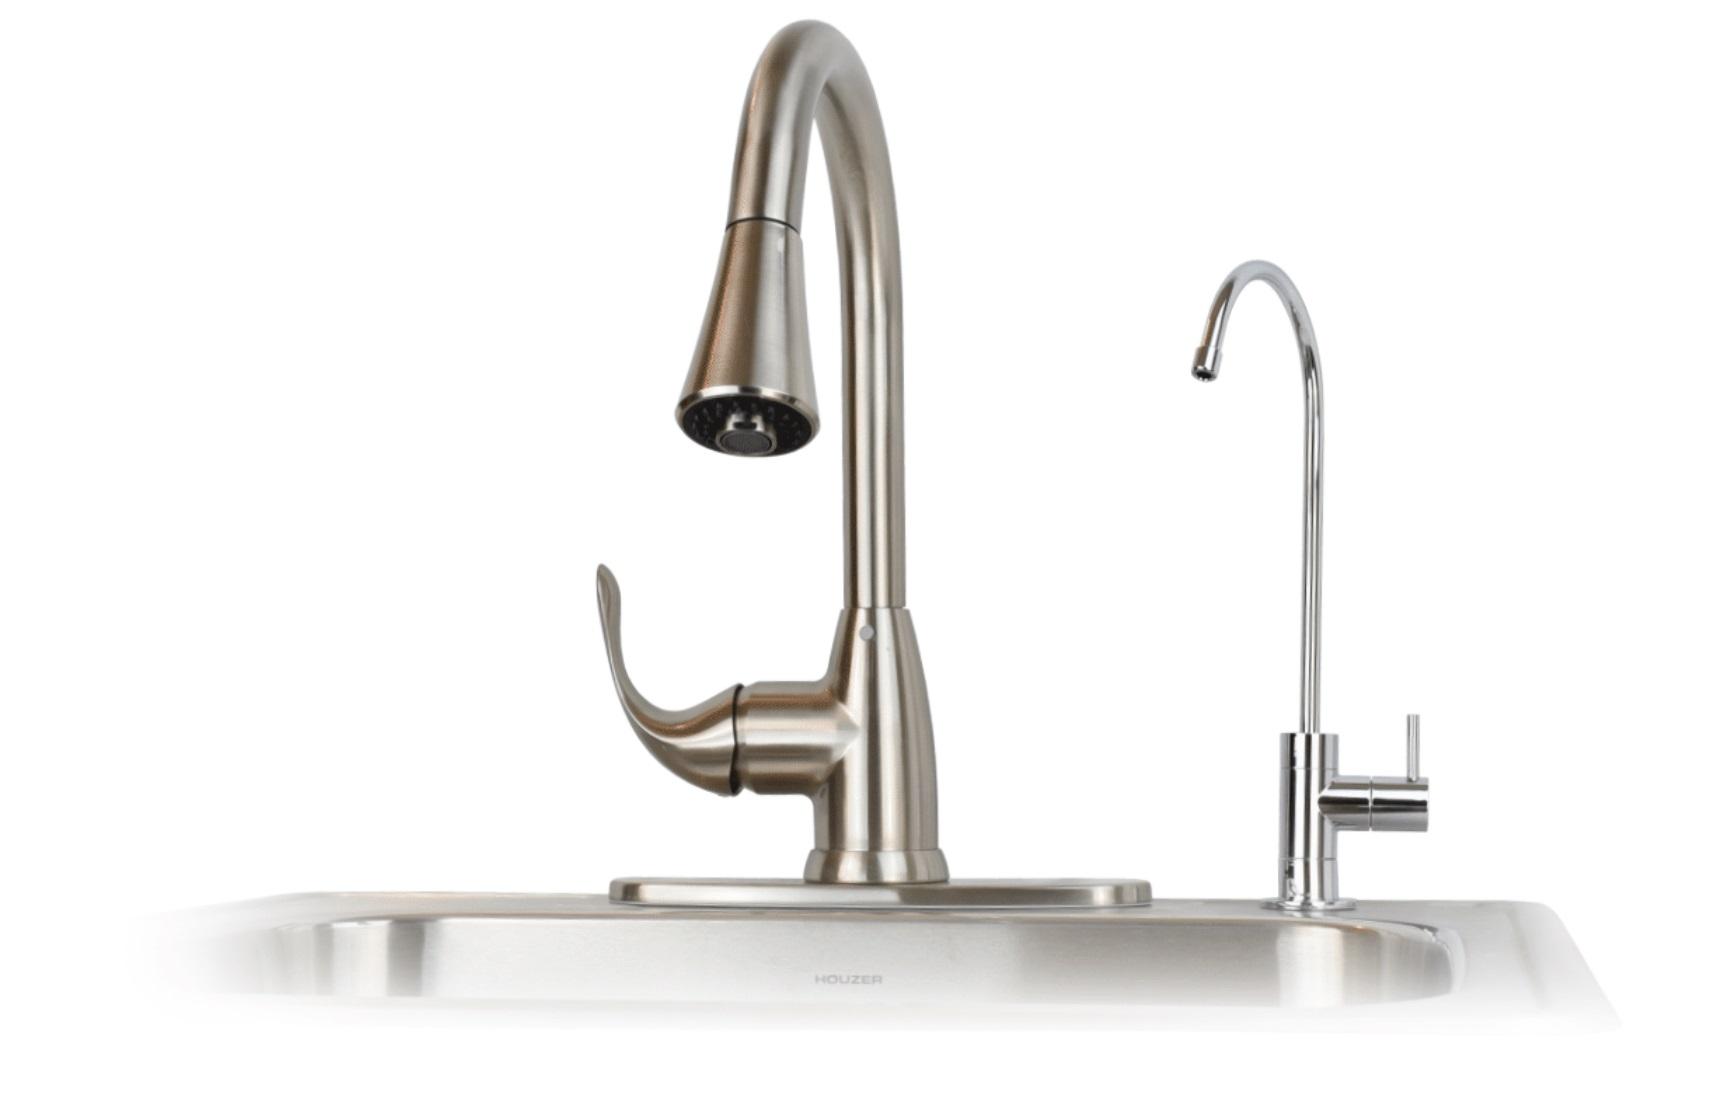 RO faucet flow rate